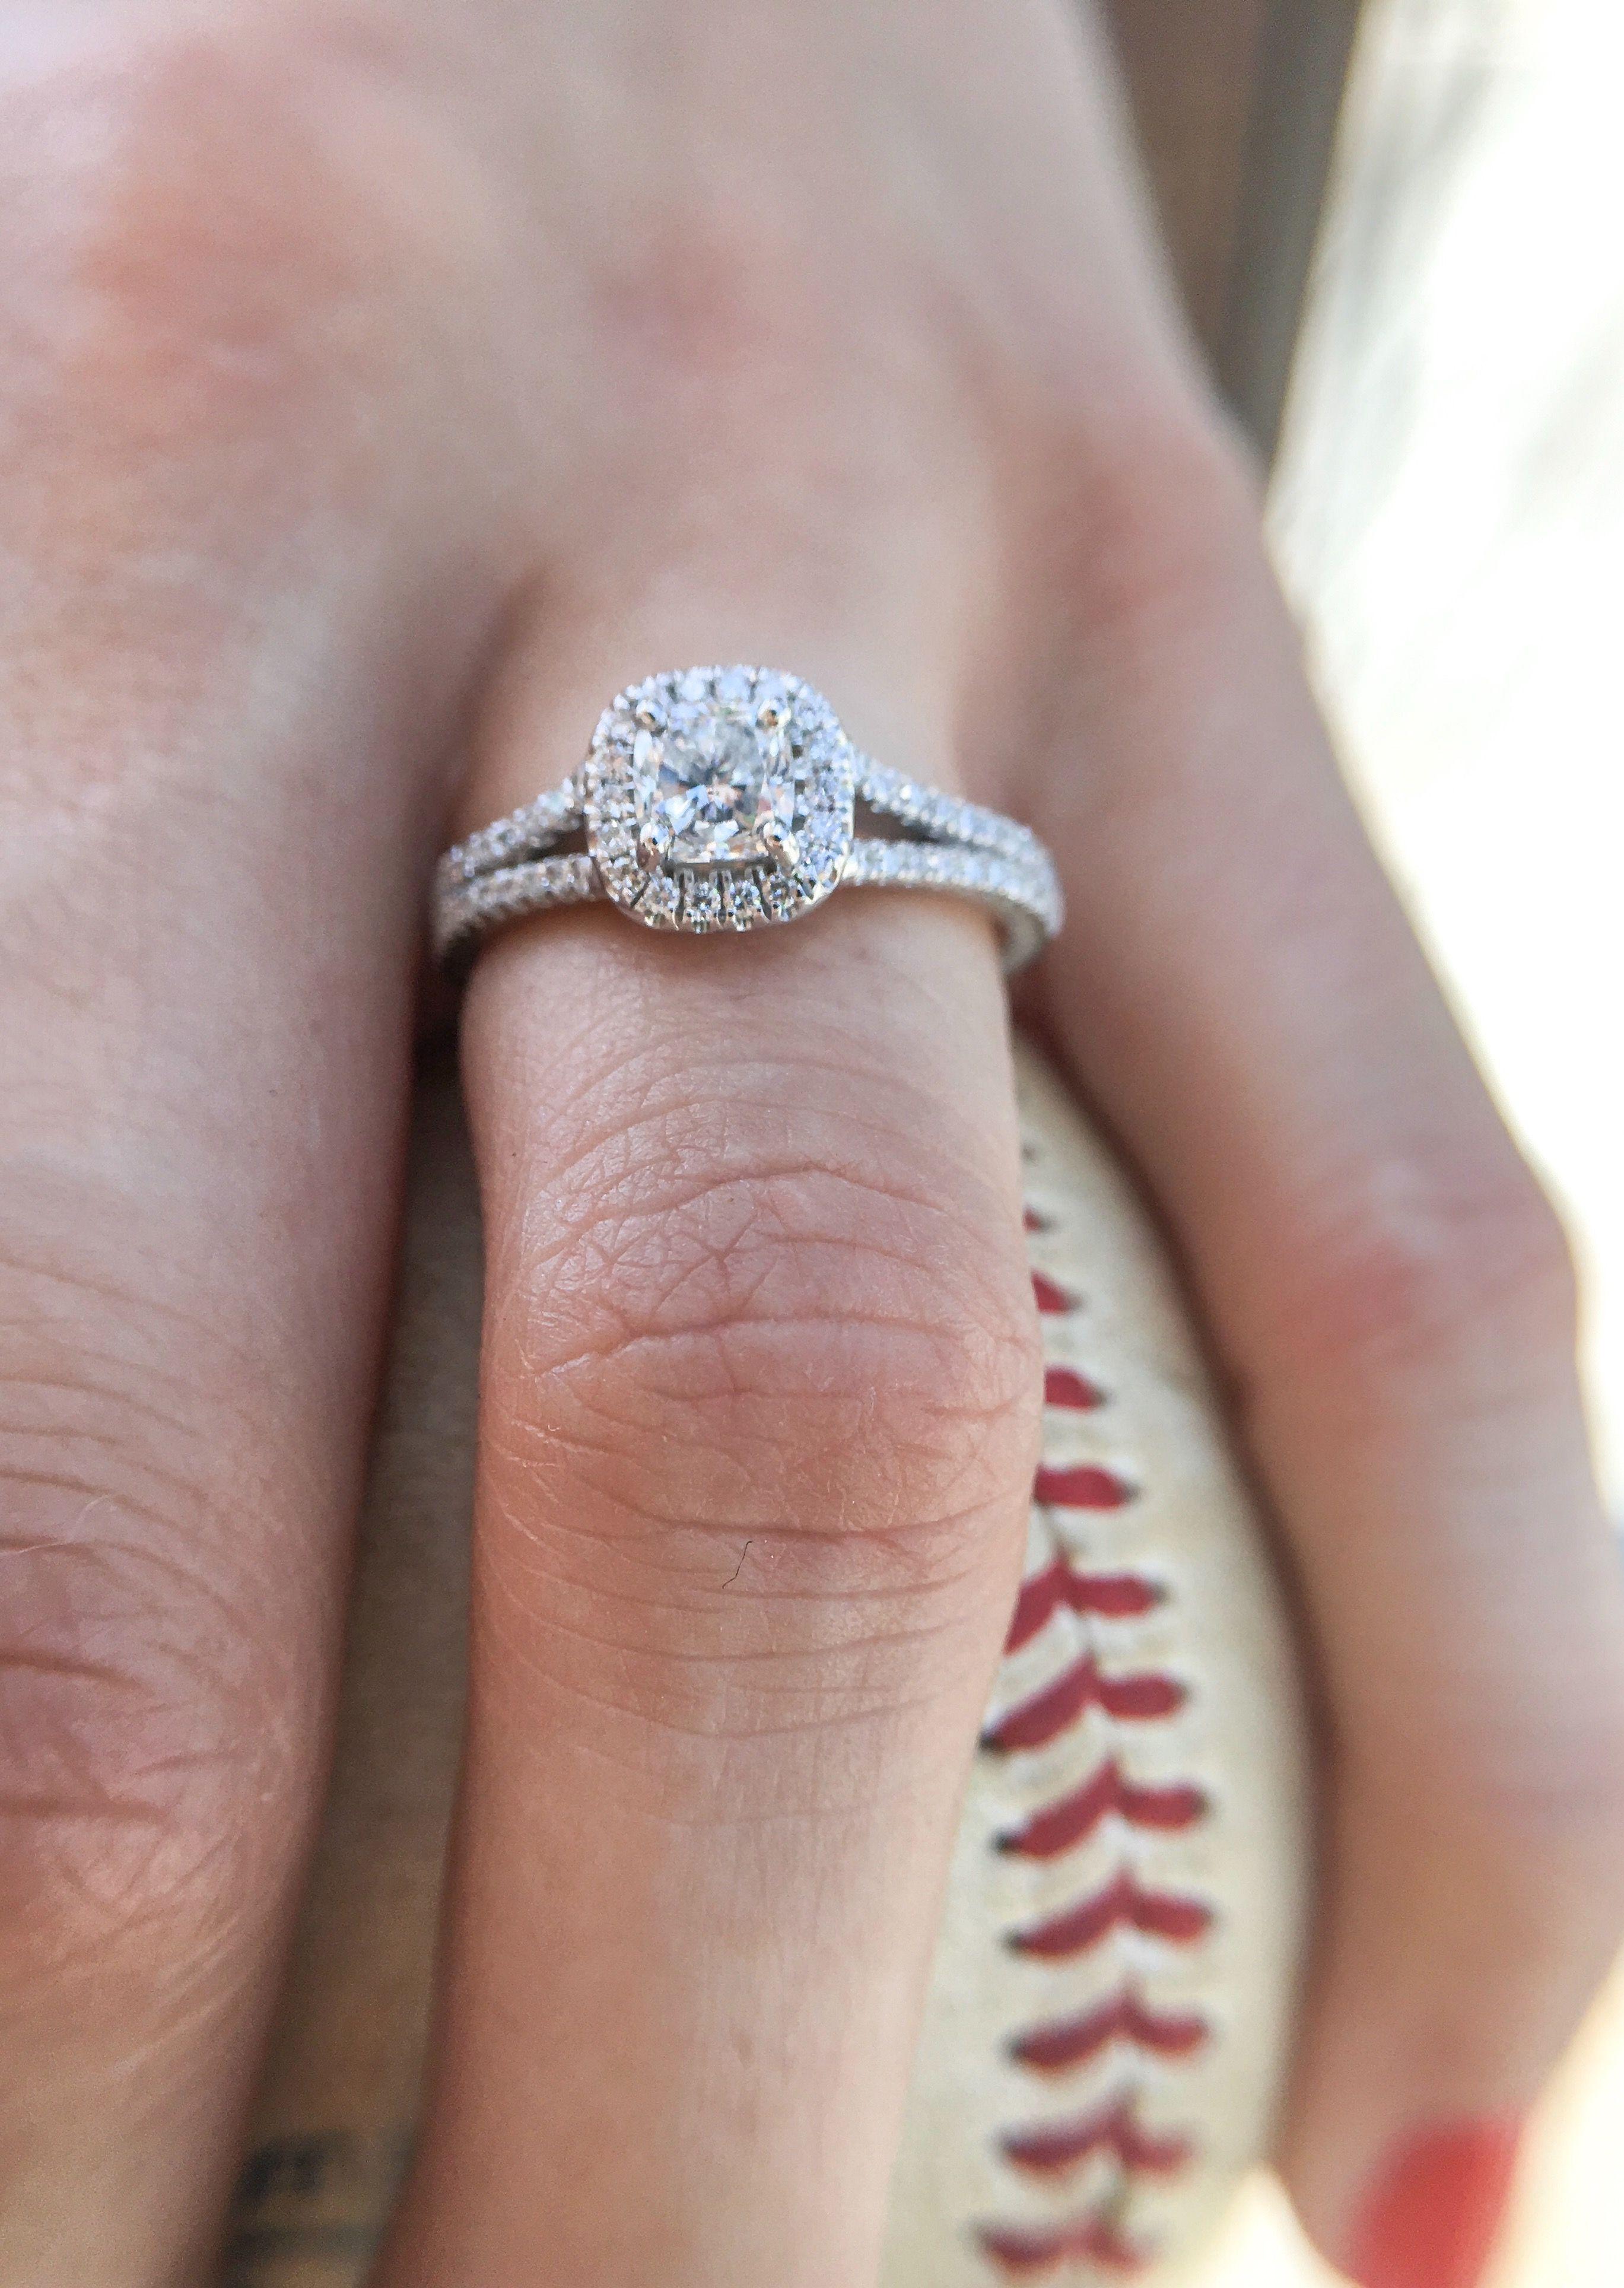 60 Best Reeds Summer 2018 Images Engagement Rings Diamond Rings